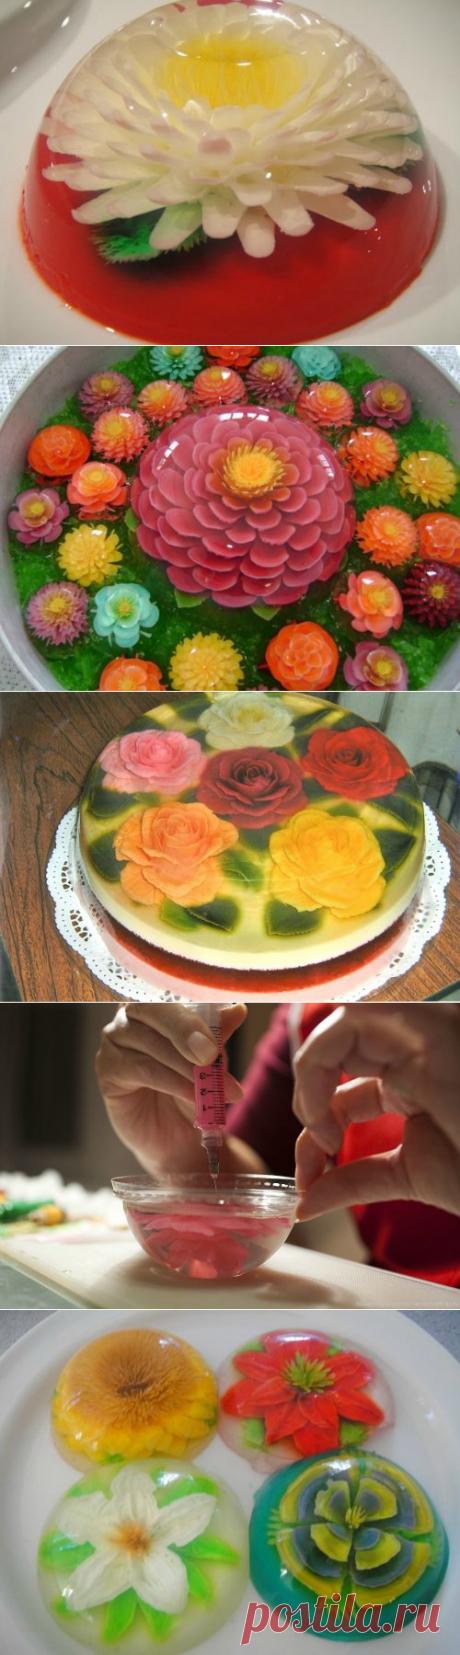 3D цветы в желе. Видео мастер-класс | Домохозяйка